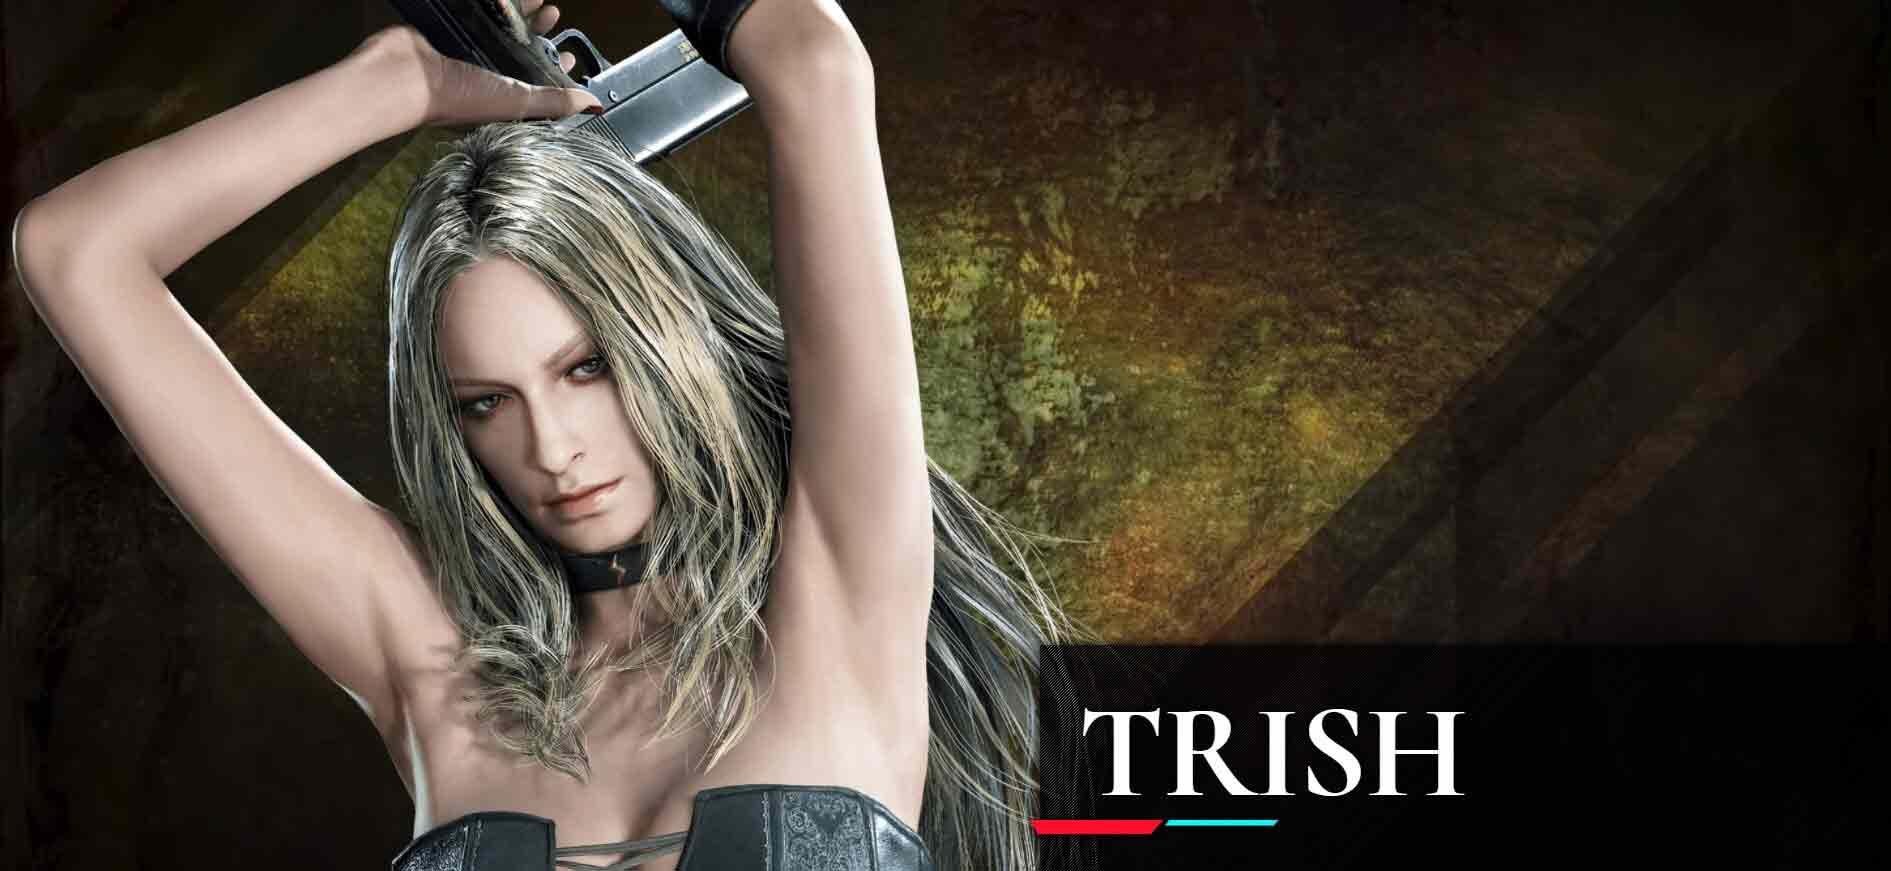 Trish-Devil-May-Cry-แม่สาว-มือปืนโหด1